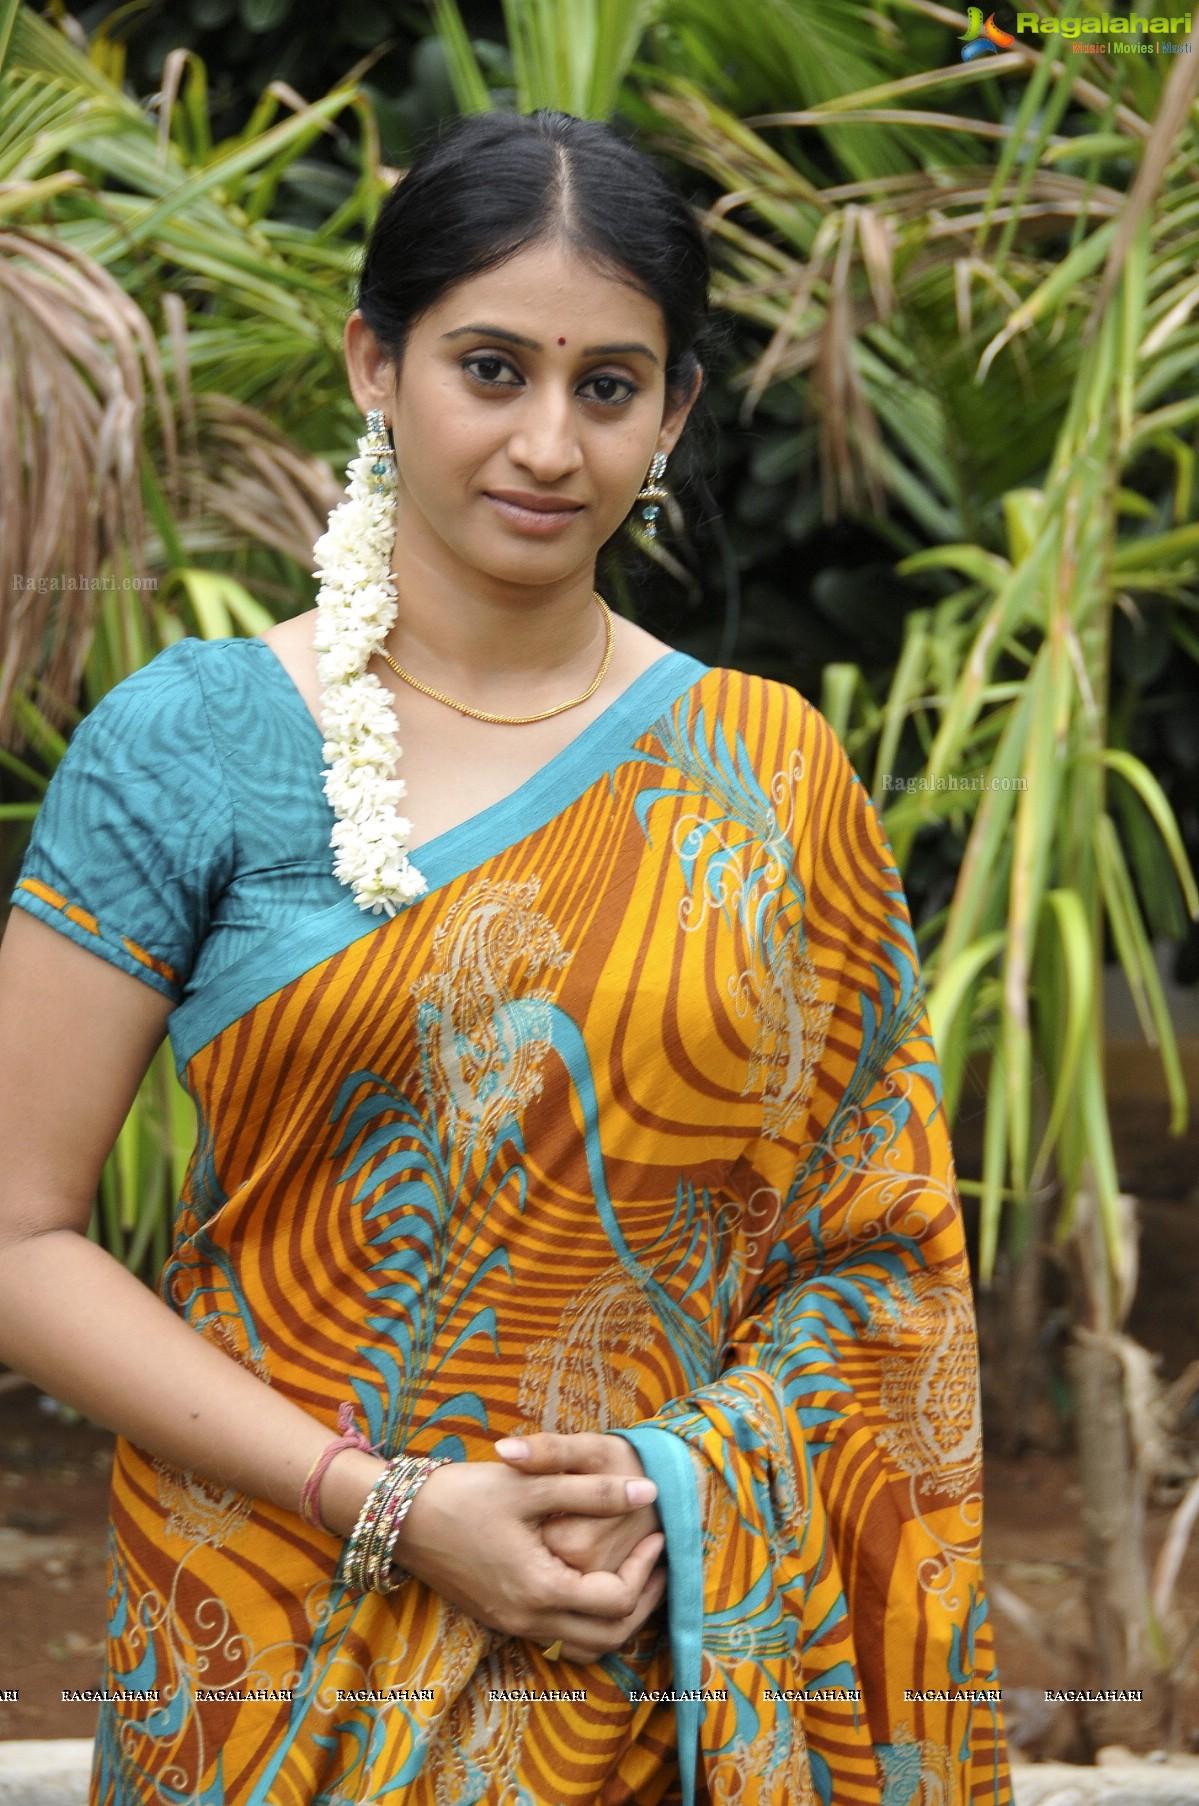 Meena fake 1080p pics 29